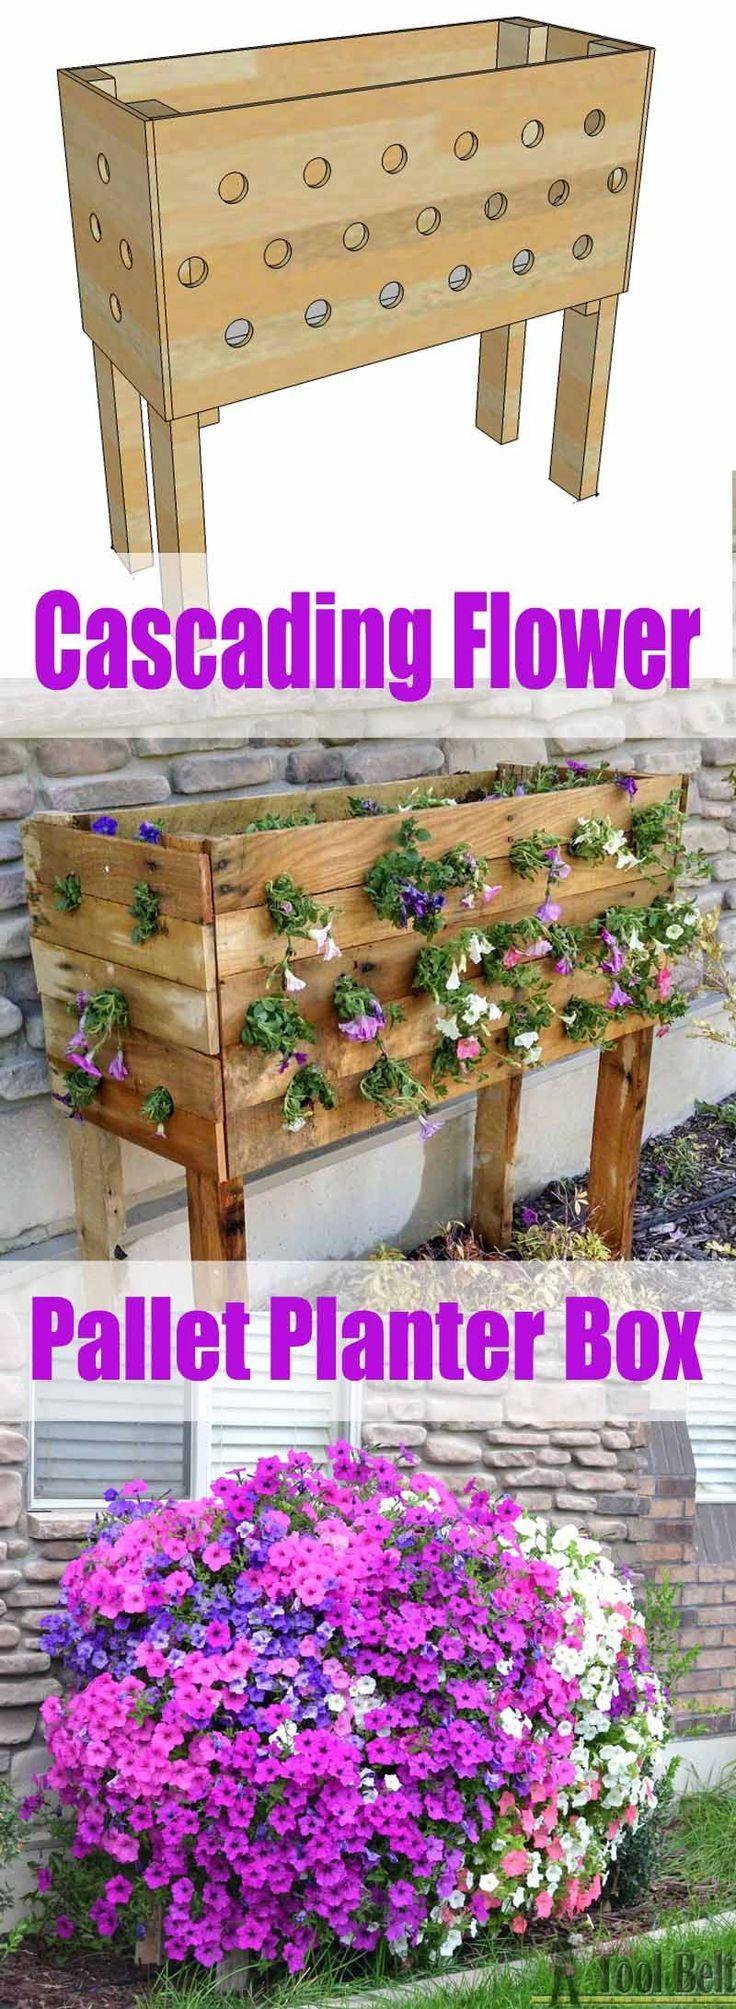 DIY Cascading Flower Pallet Planter Box.